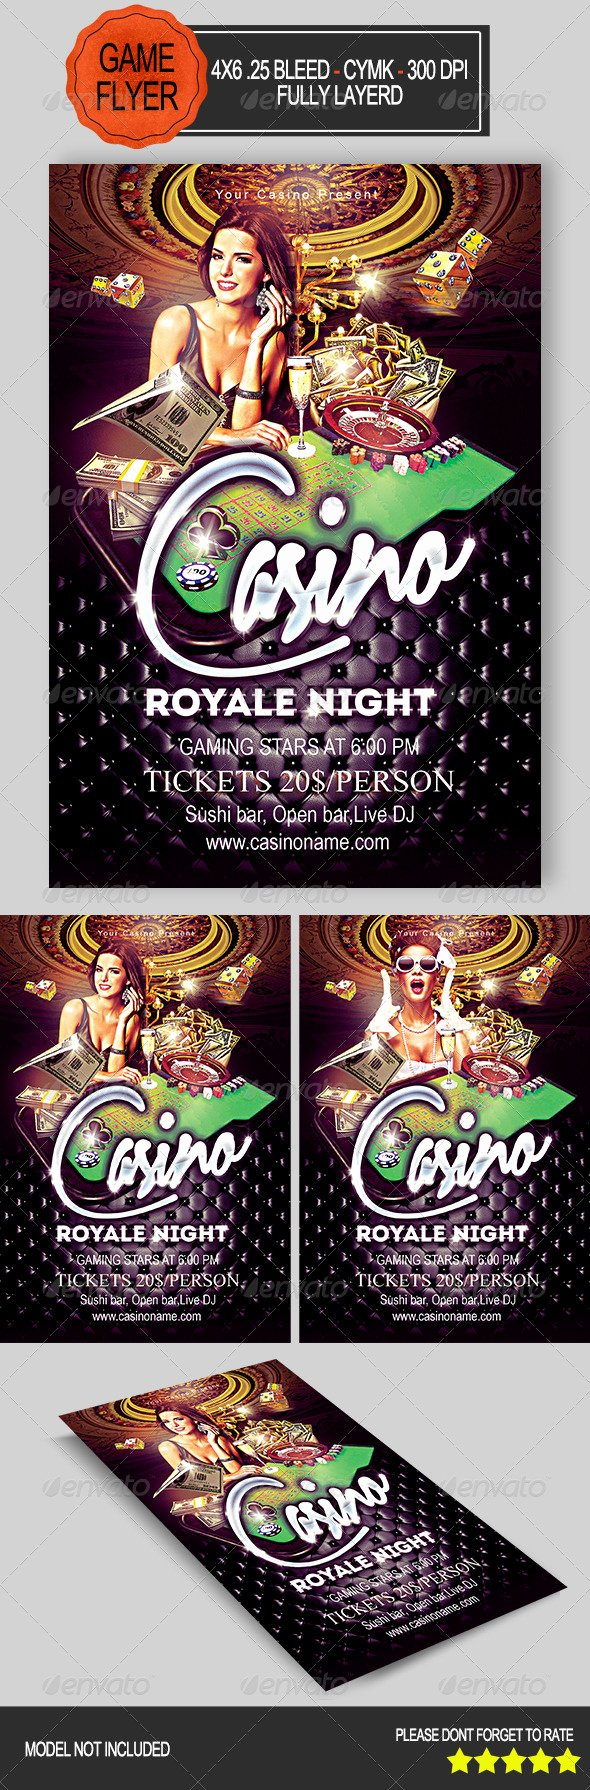 Game Night Flyer Template Luxury Free Blank Casino Night Flyer Tinkytyler Stock